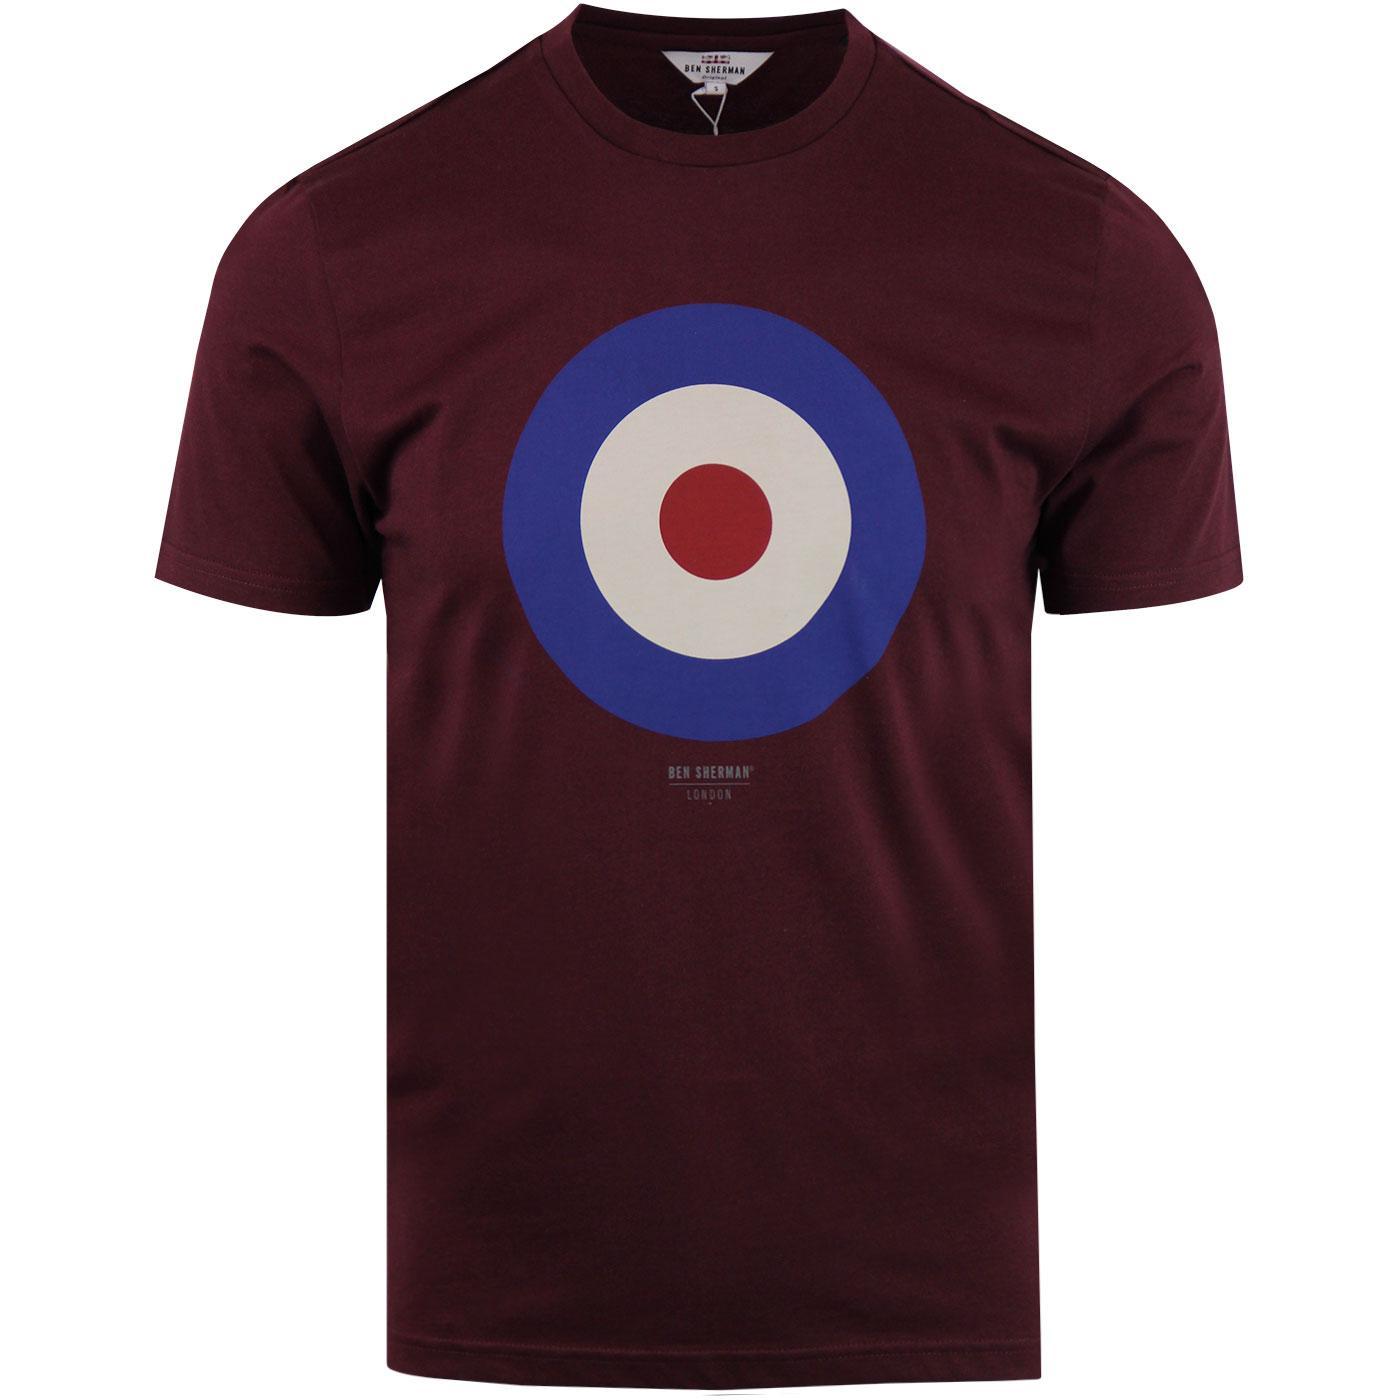 BEN SHERMAN Retro 1960s Mod Target T-shirt (Port)